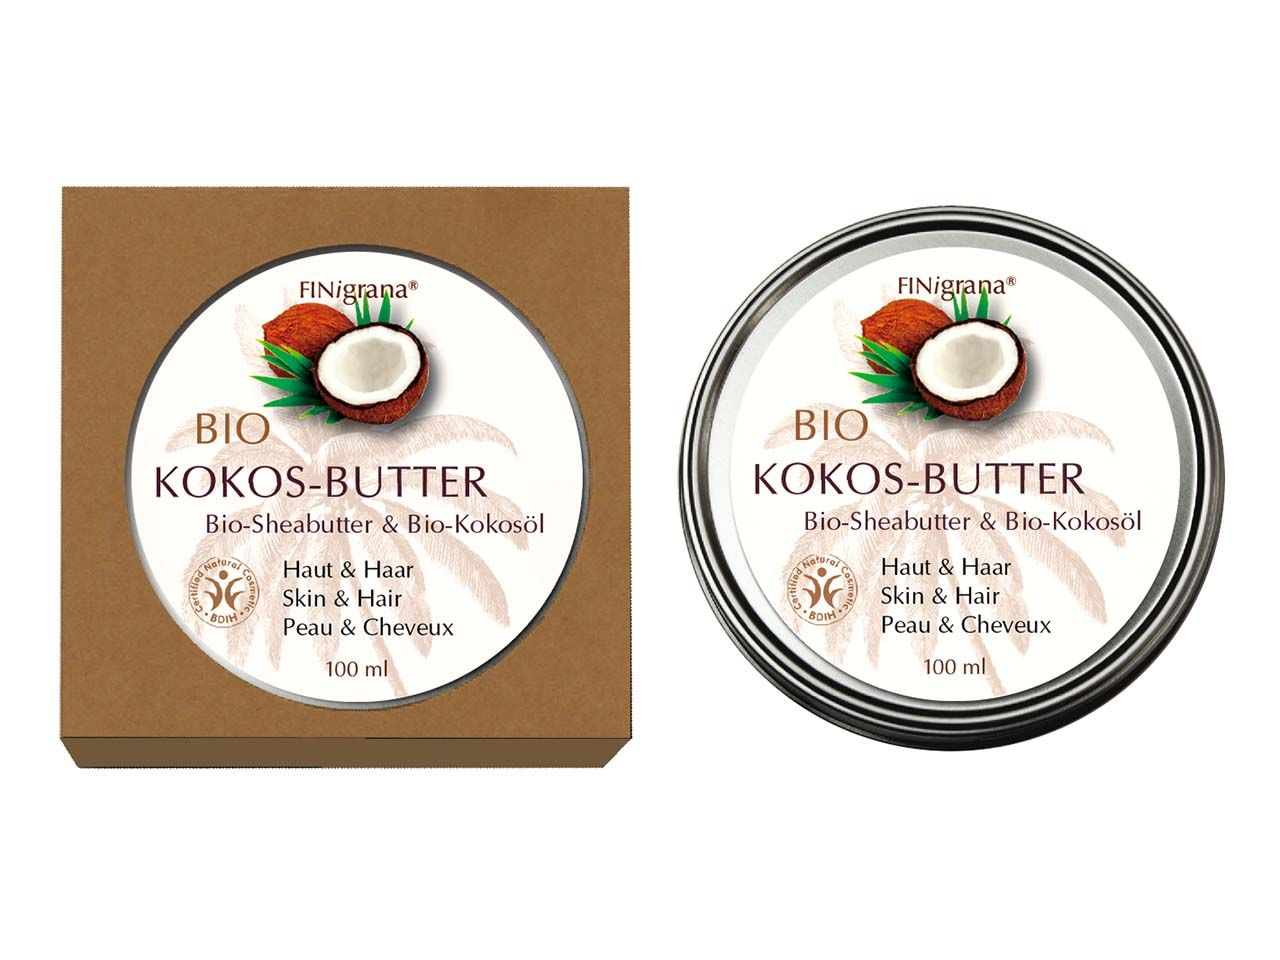 "FINigrana Bio-Kokosbutter ""Kokos-Butter"" soft, 100 ml KO100"